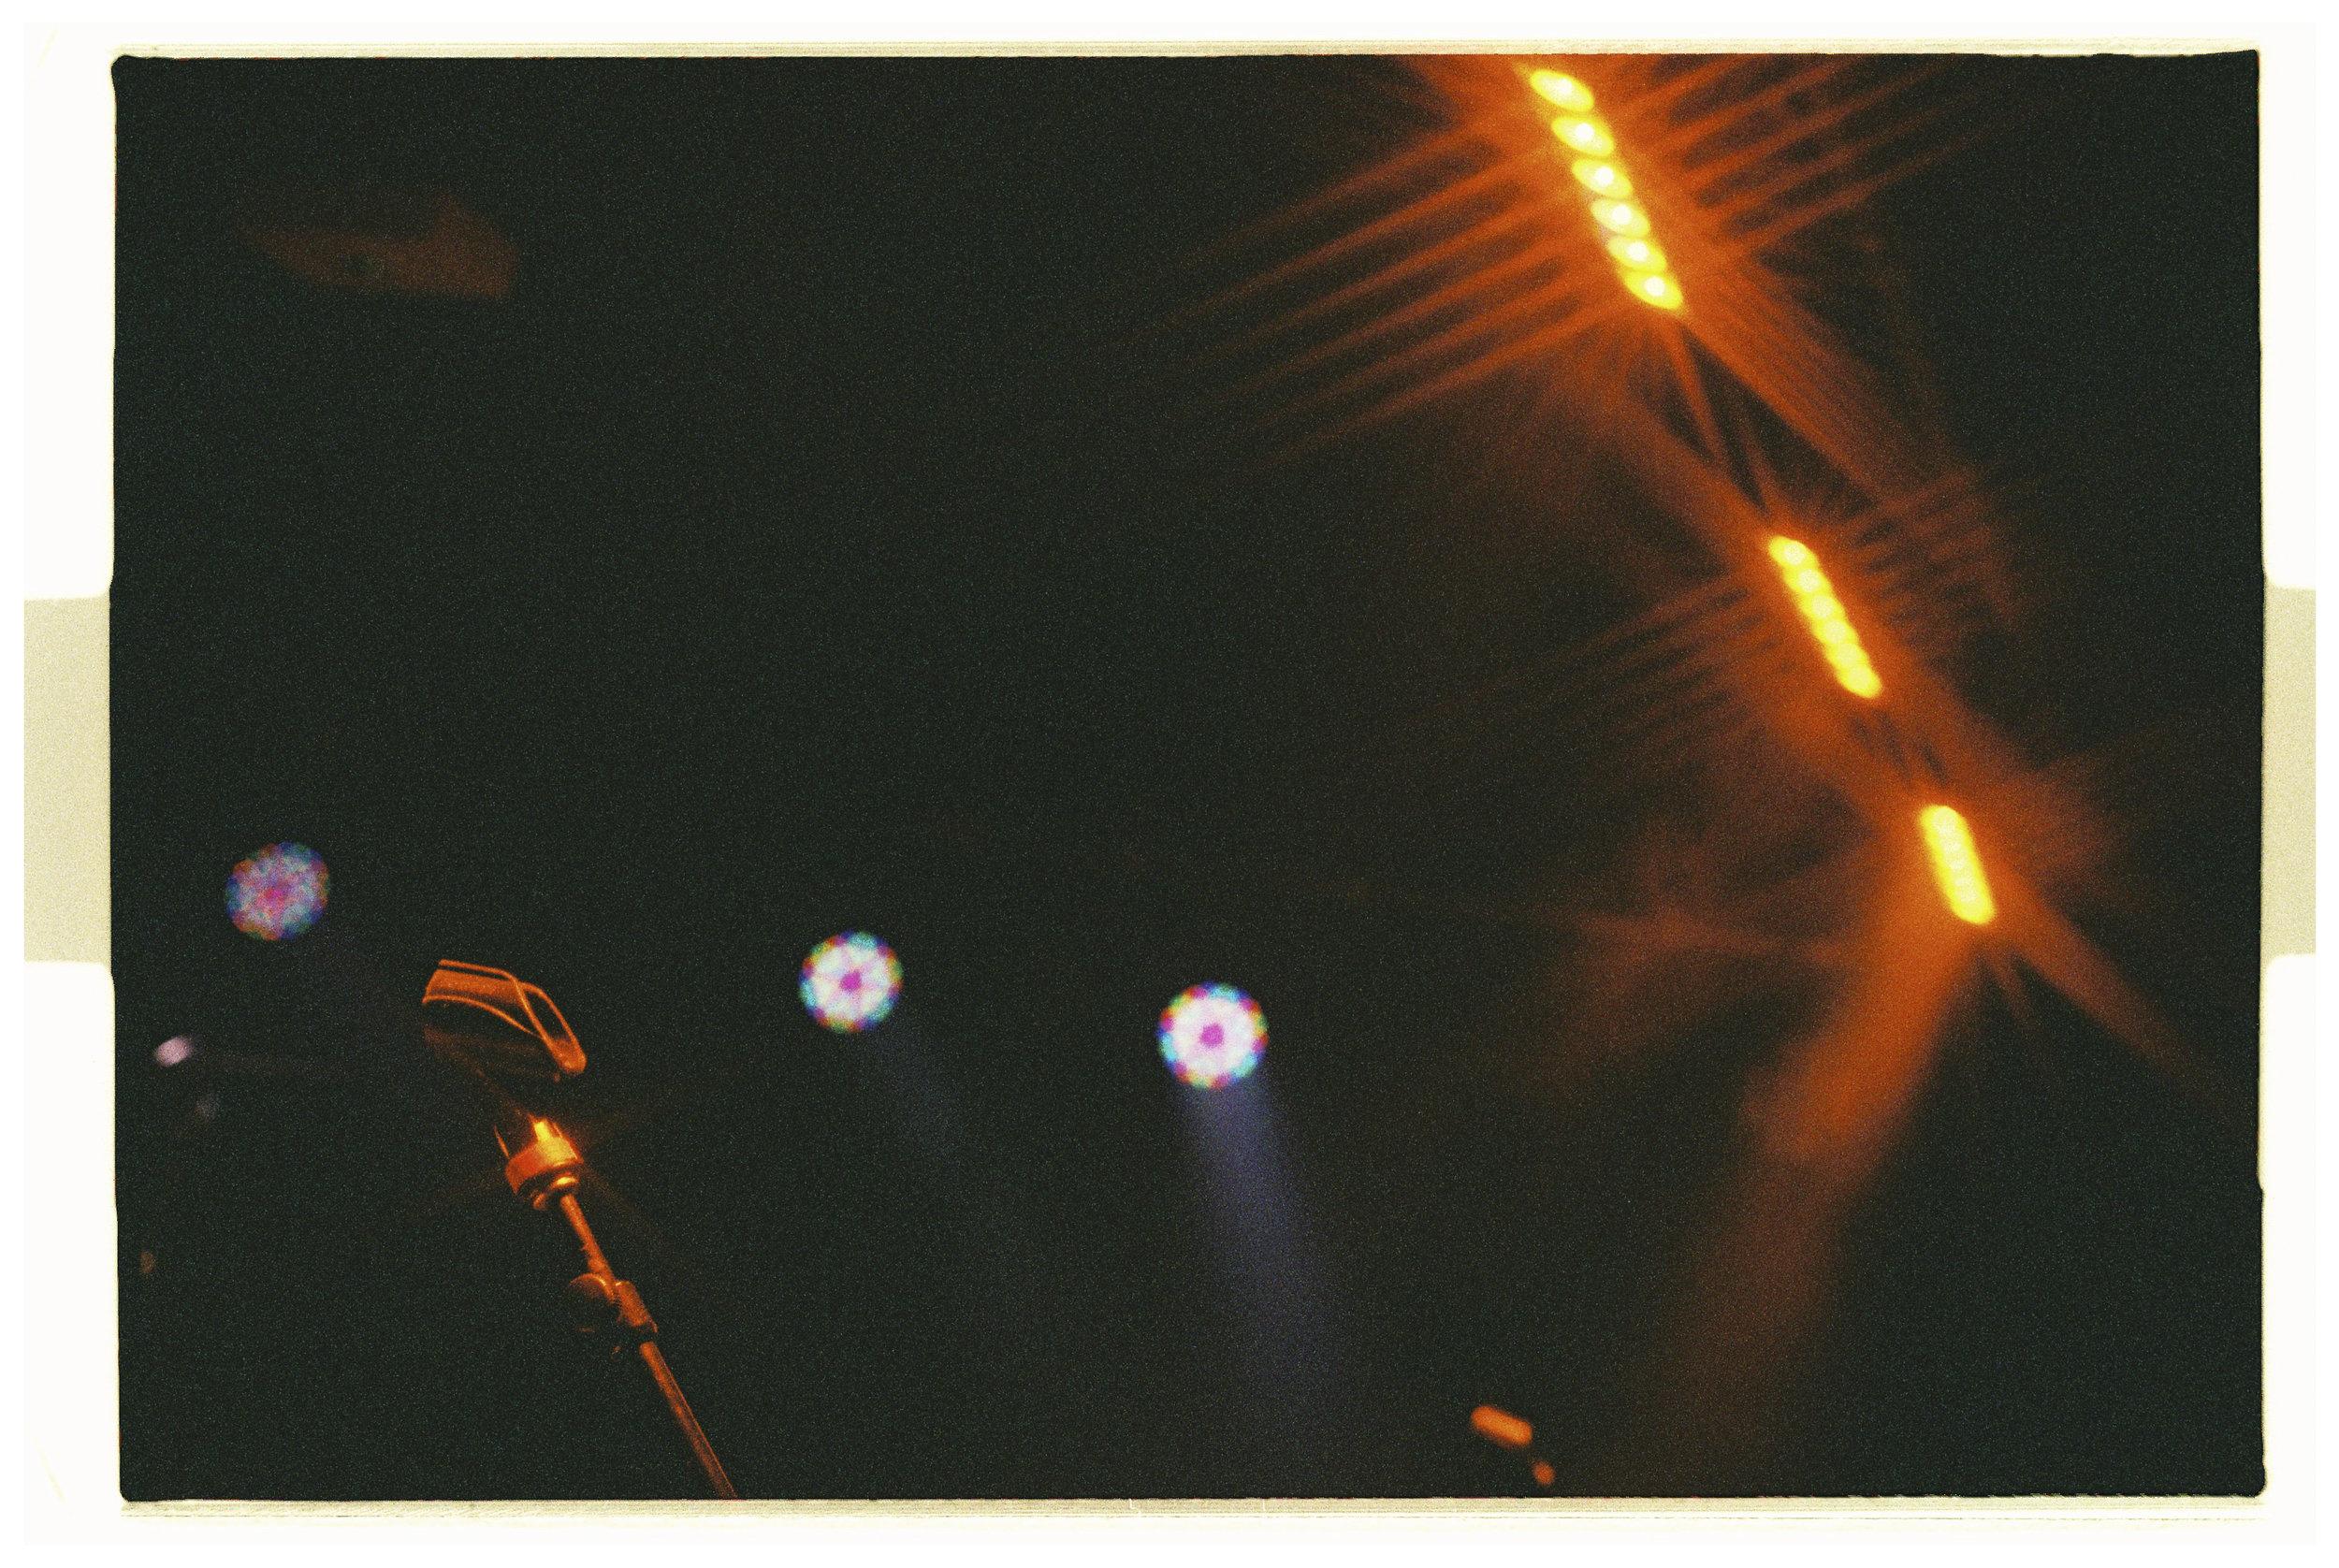 G Flip - Sept 13th - Fuji Superia 1600 - Nikon F3 - 1.jpg